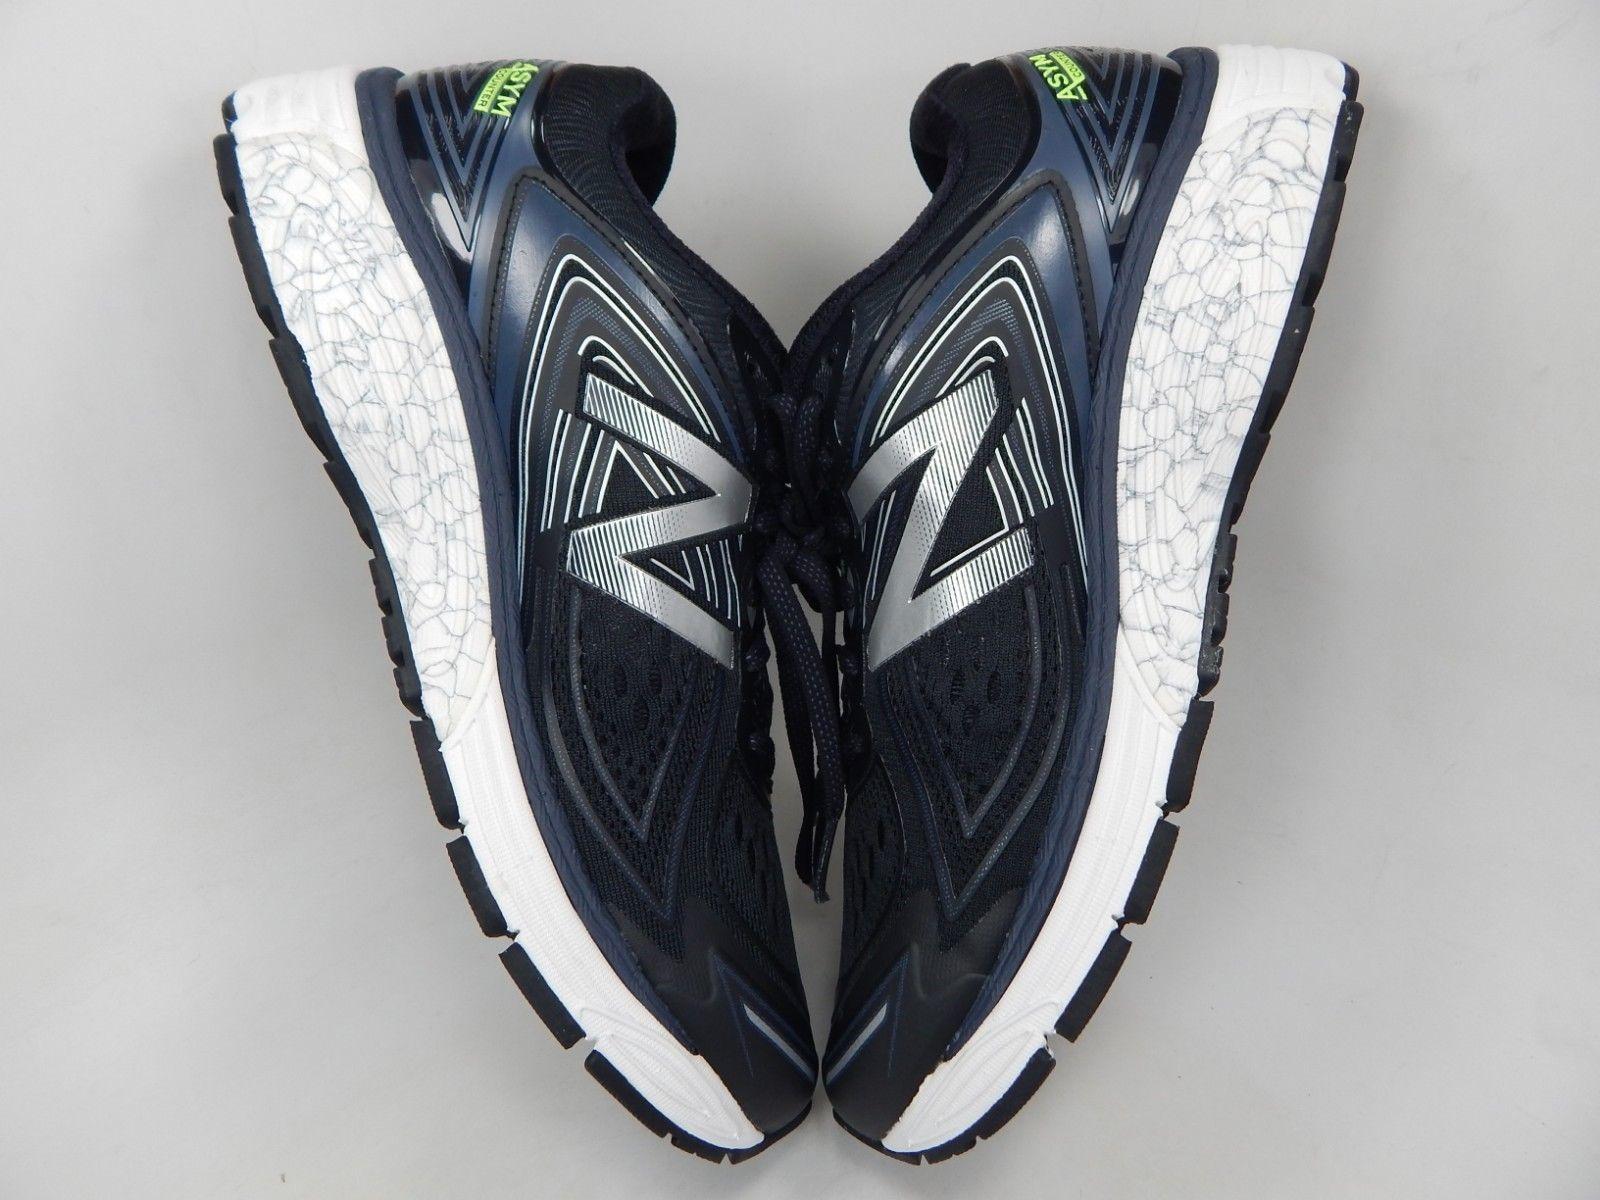 New Balance 860 v8 Size 7 2E WIDE EU 40 Men's Running Shoes Black M860BW8